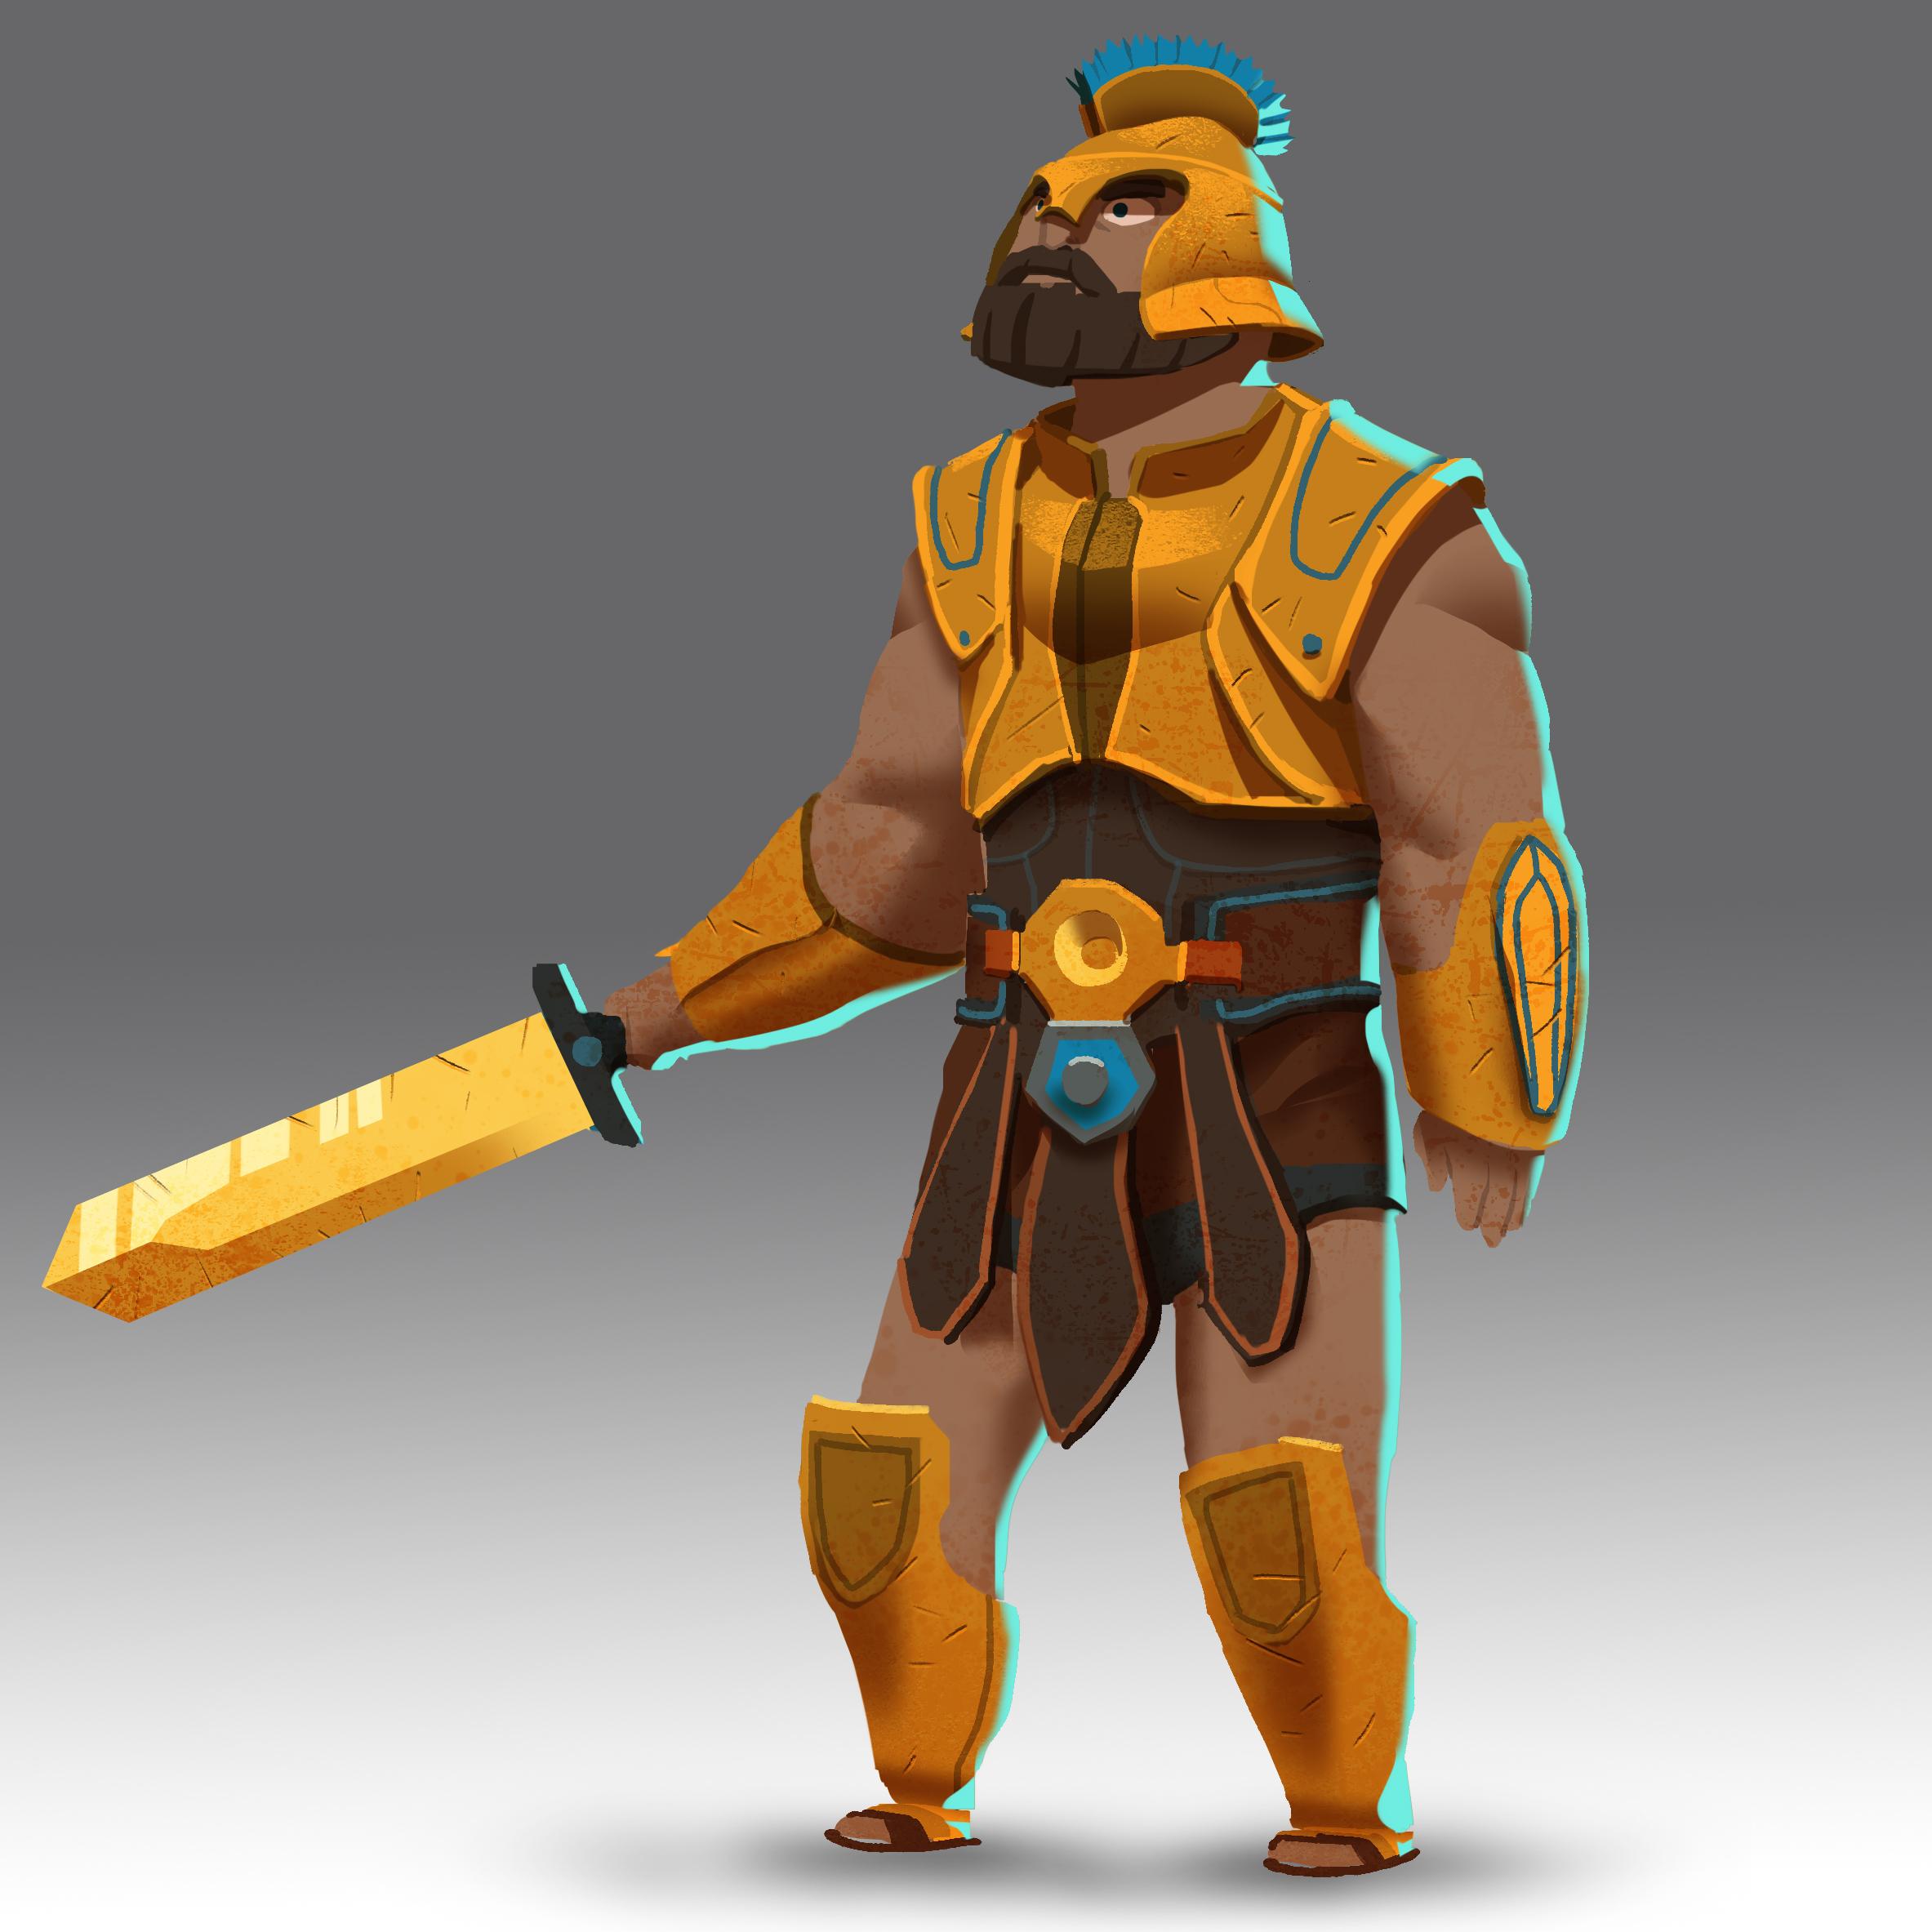 Gold_mustach_man.jpg